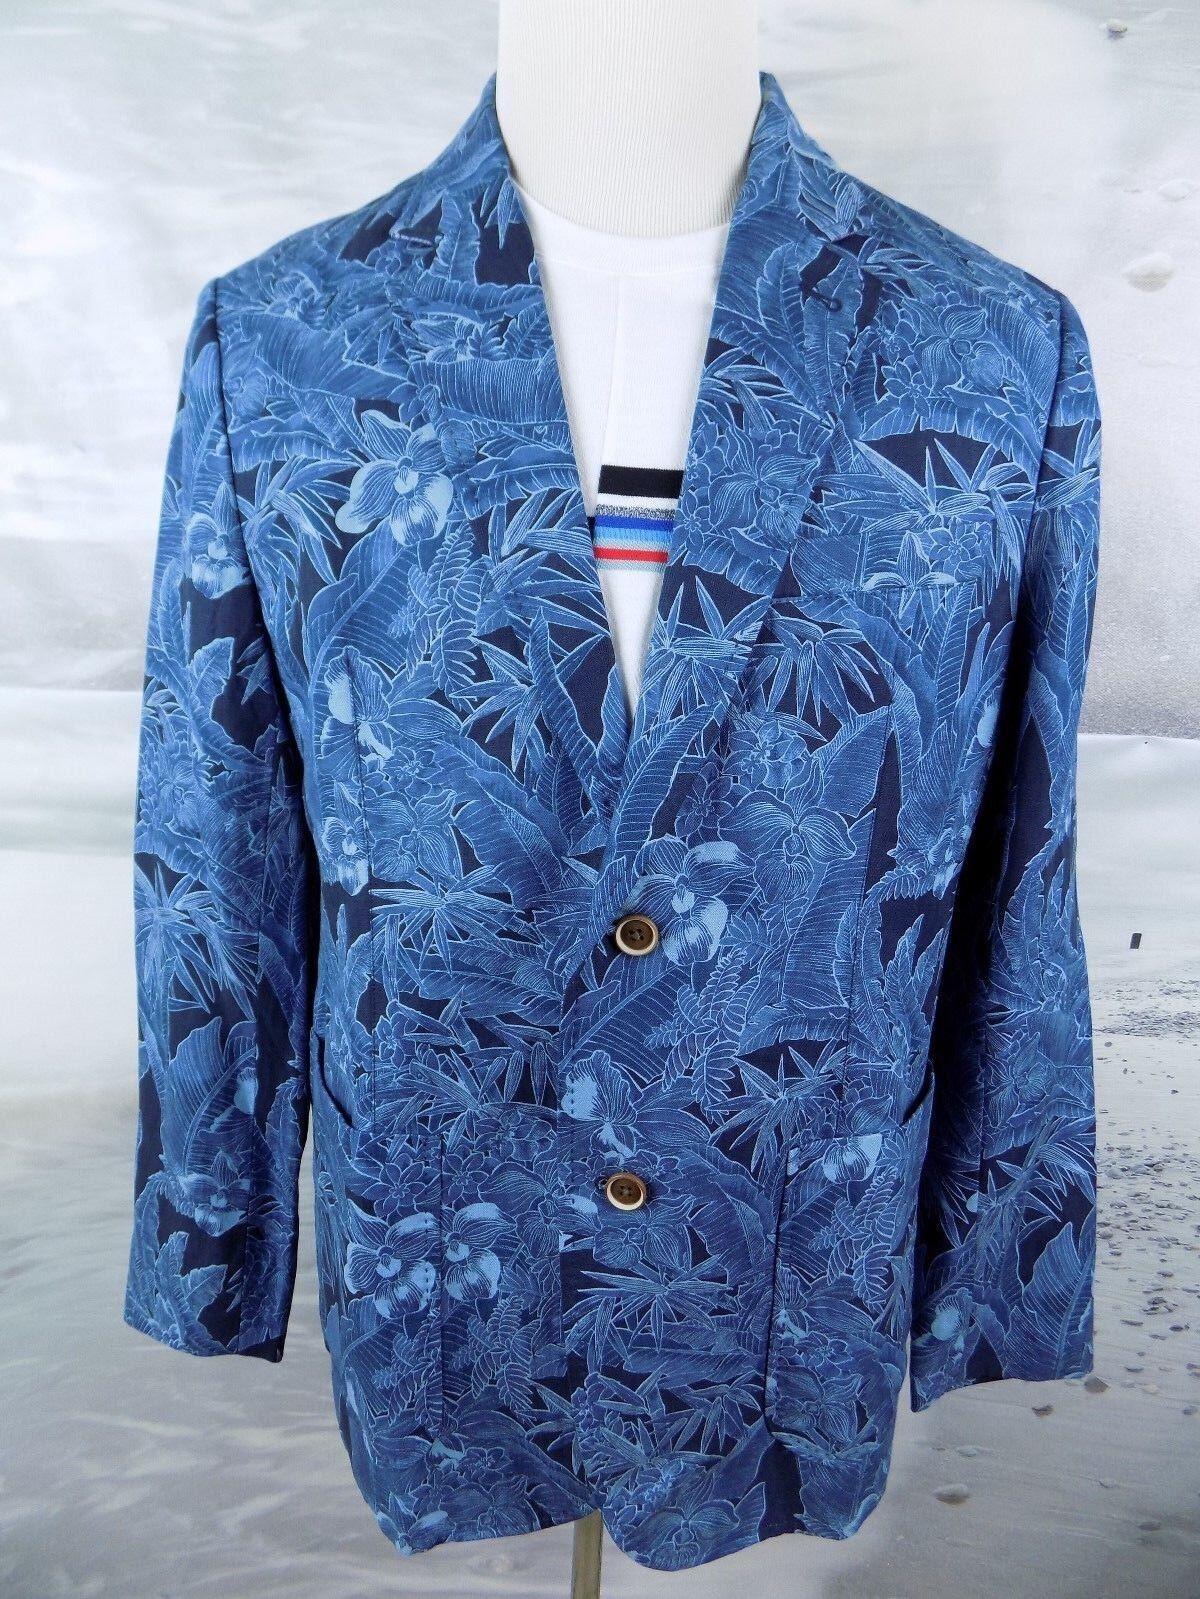 325 NWT Tommy Bahama Blazer Oasis Blooms Blau Größe-Large